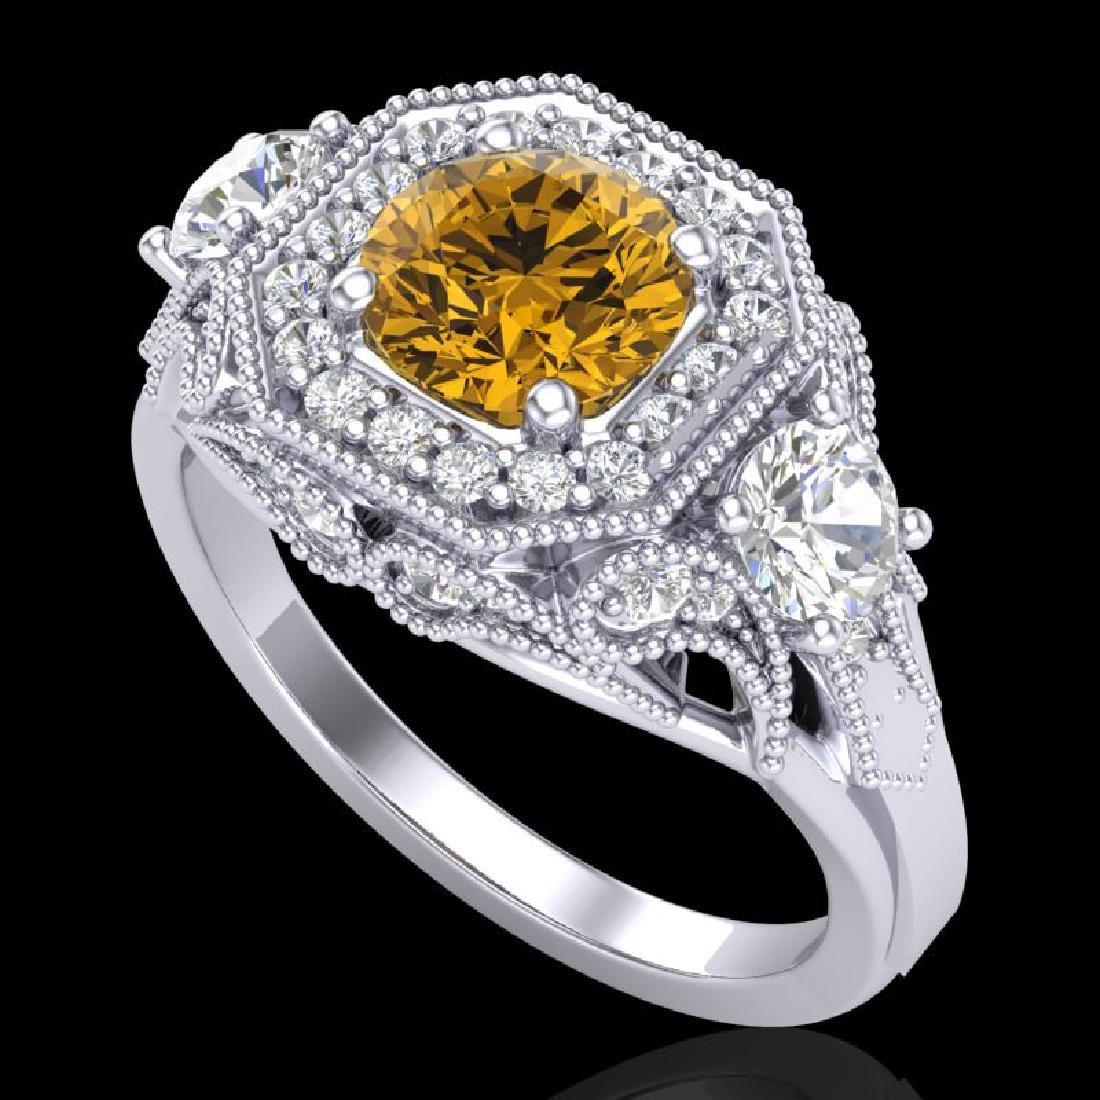 2.11 CTW Intense Fancy Yellow Diamond Art Deco 3 Stone